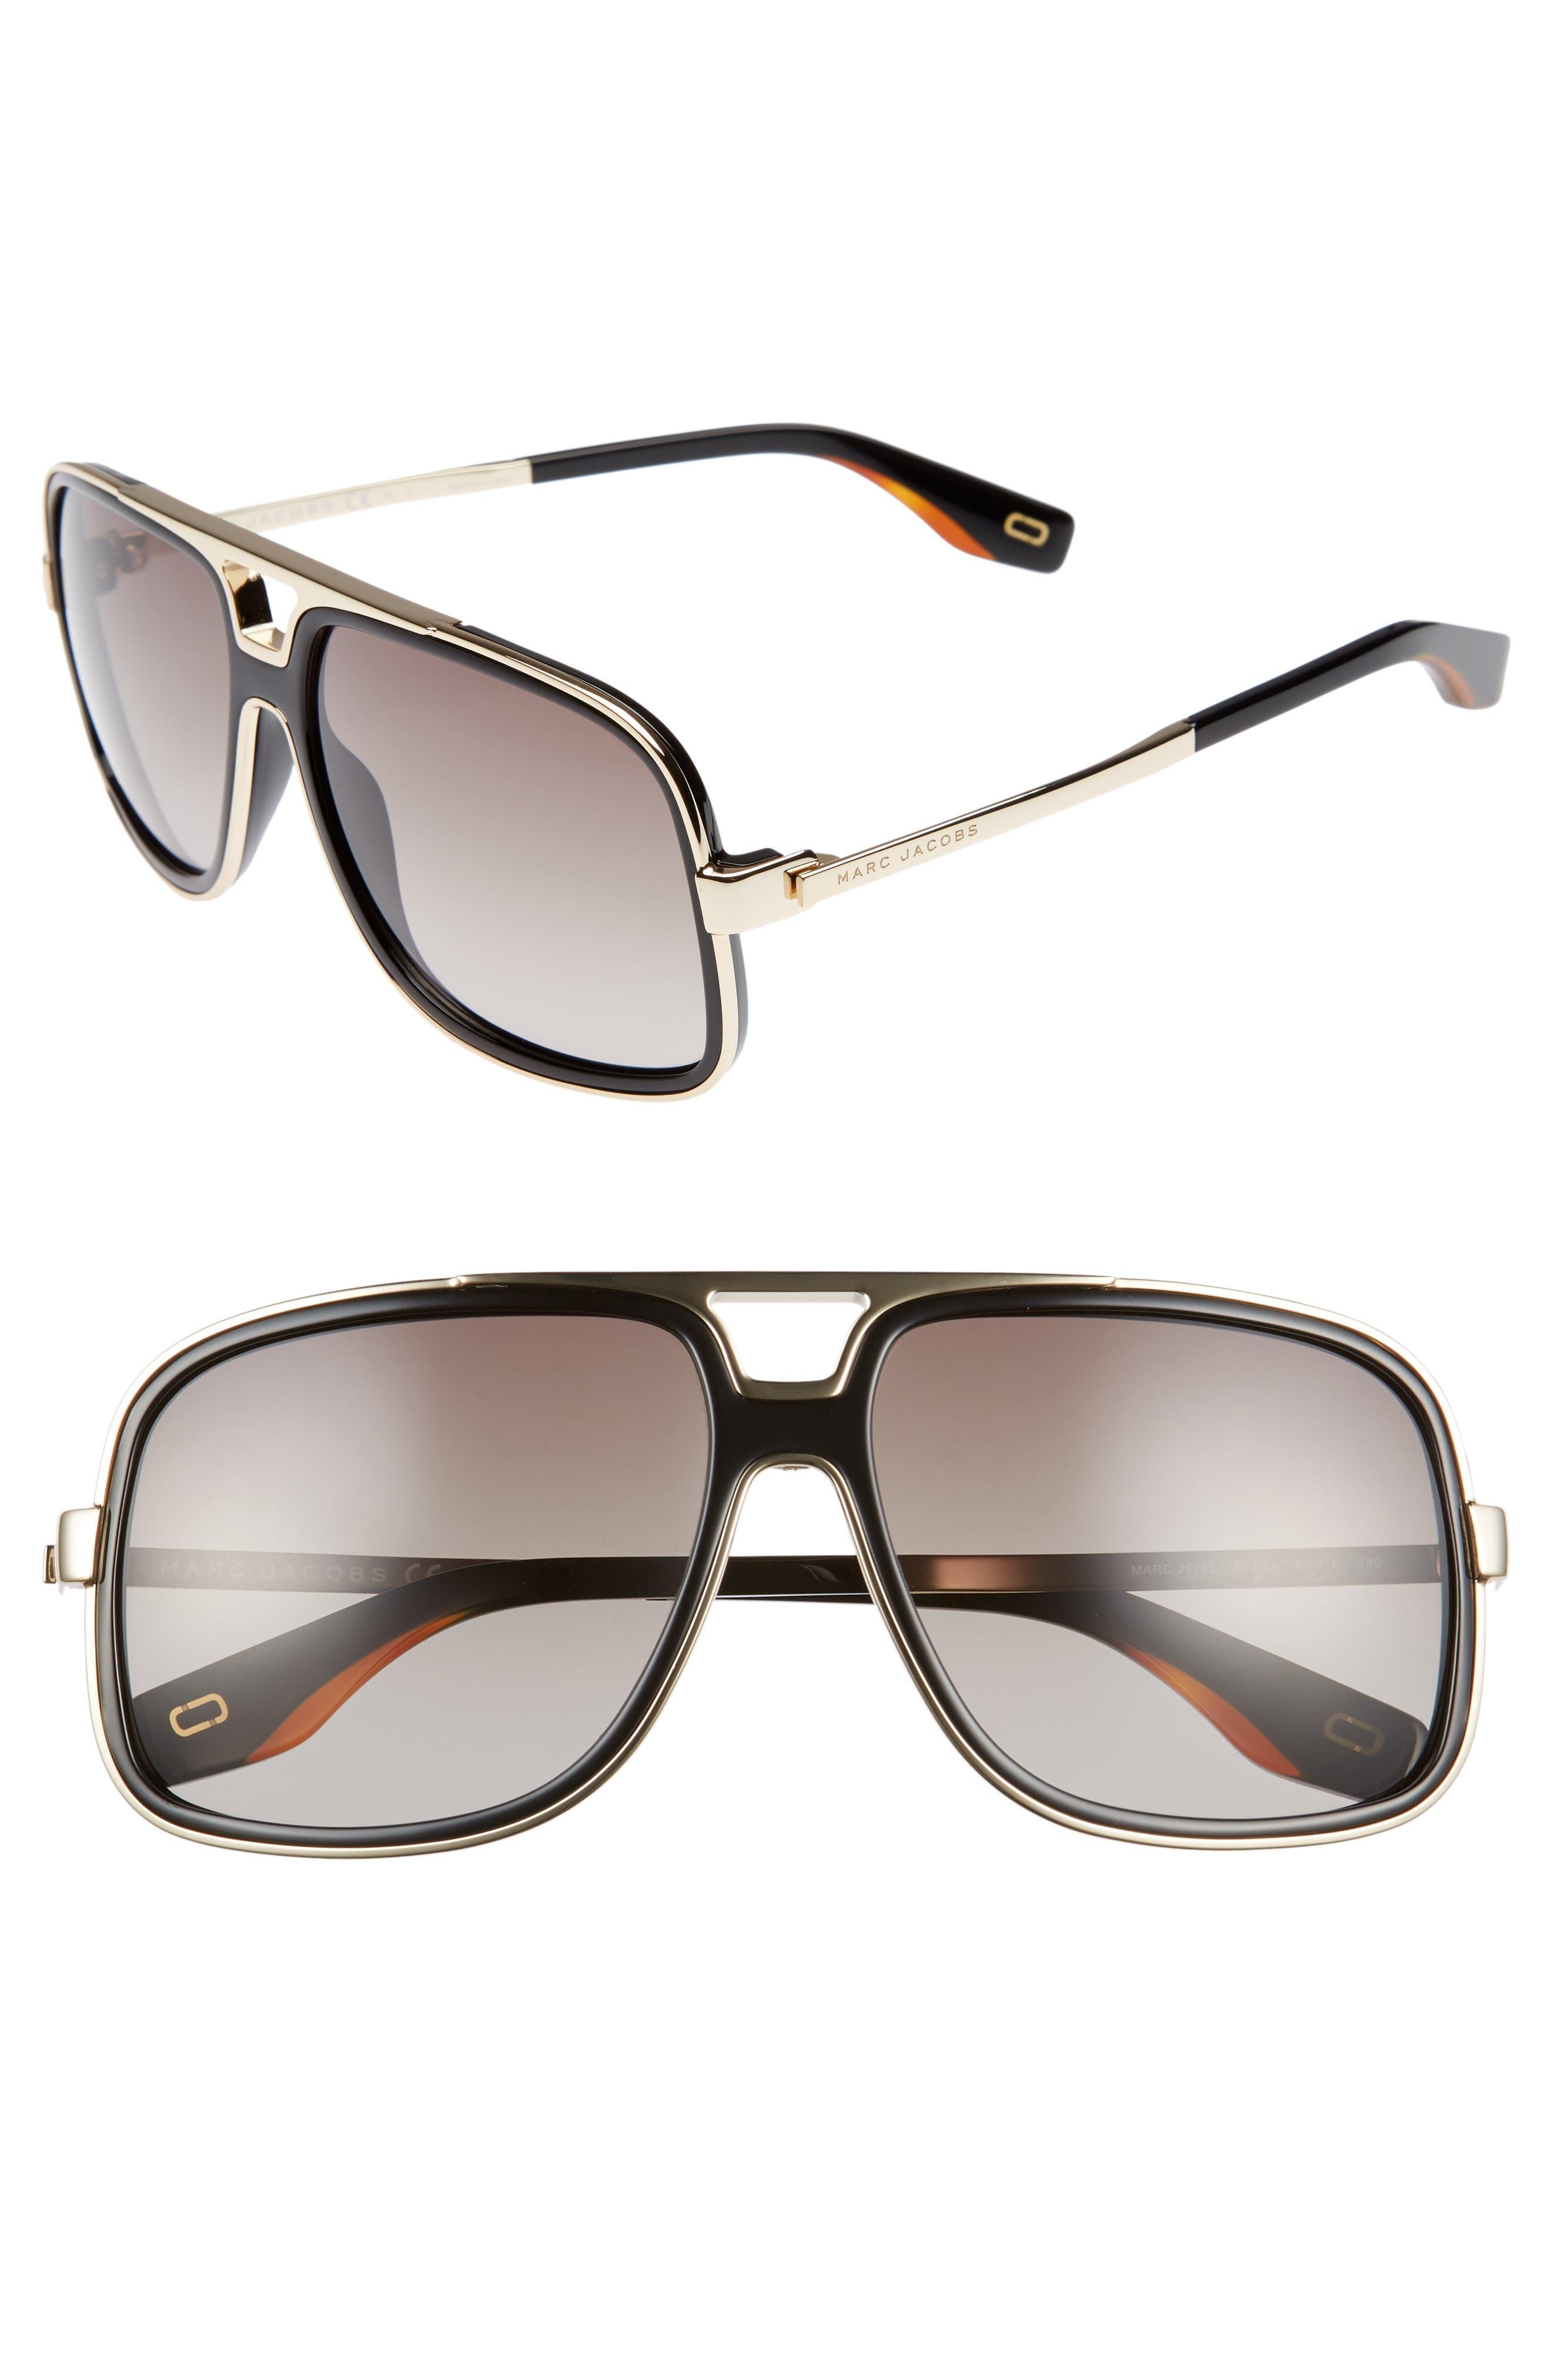 60mm Gradient Lens Aviator Sunglasses,                         Main,                         color, BLACK